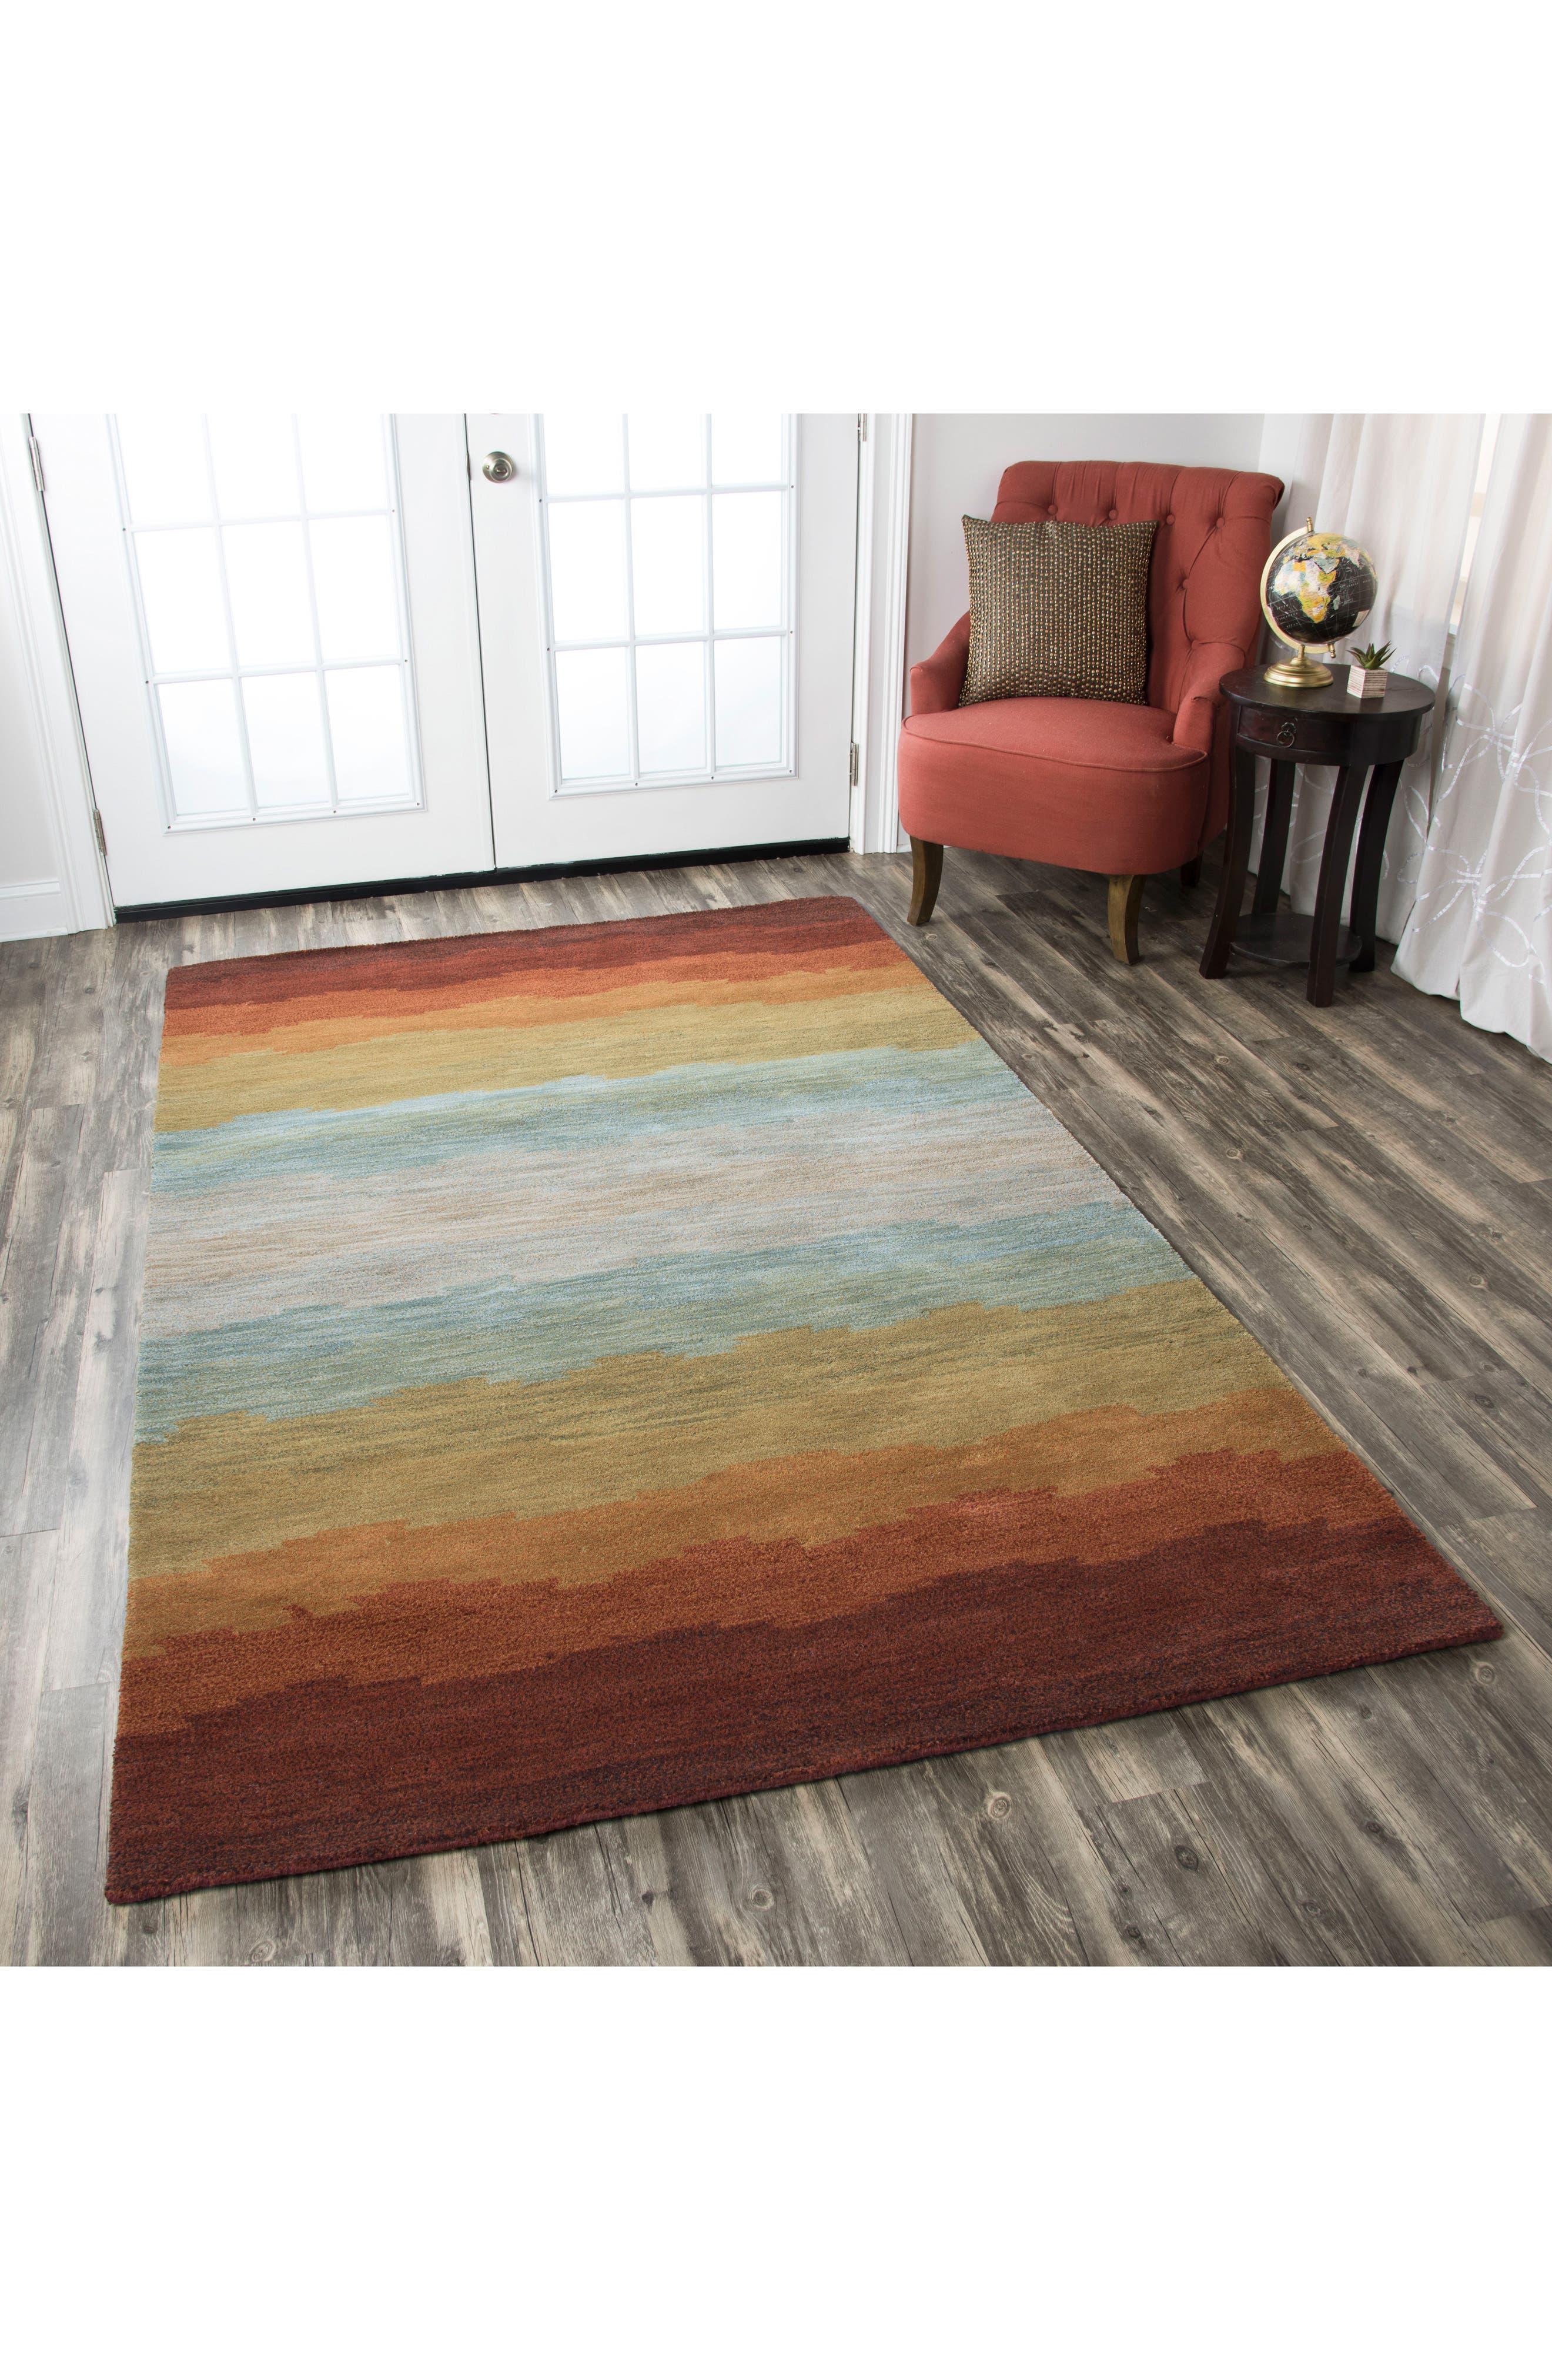 Desert Oasis Hand Tufted Wool Area Rug,                             Alternate thumbnail 2, color,                             220